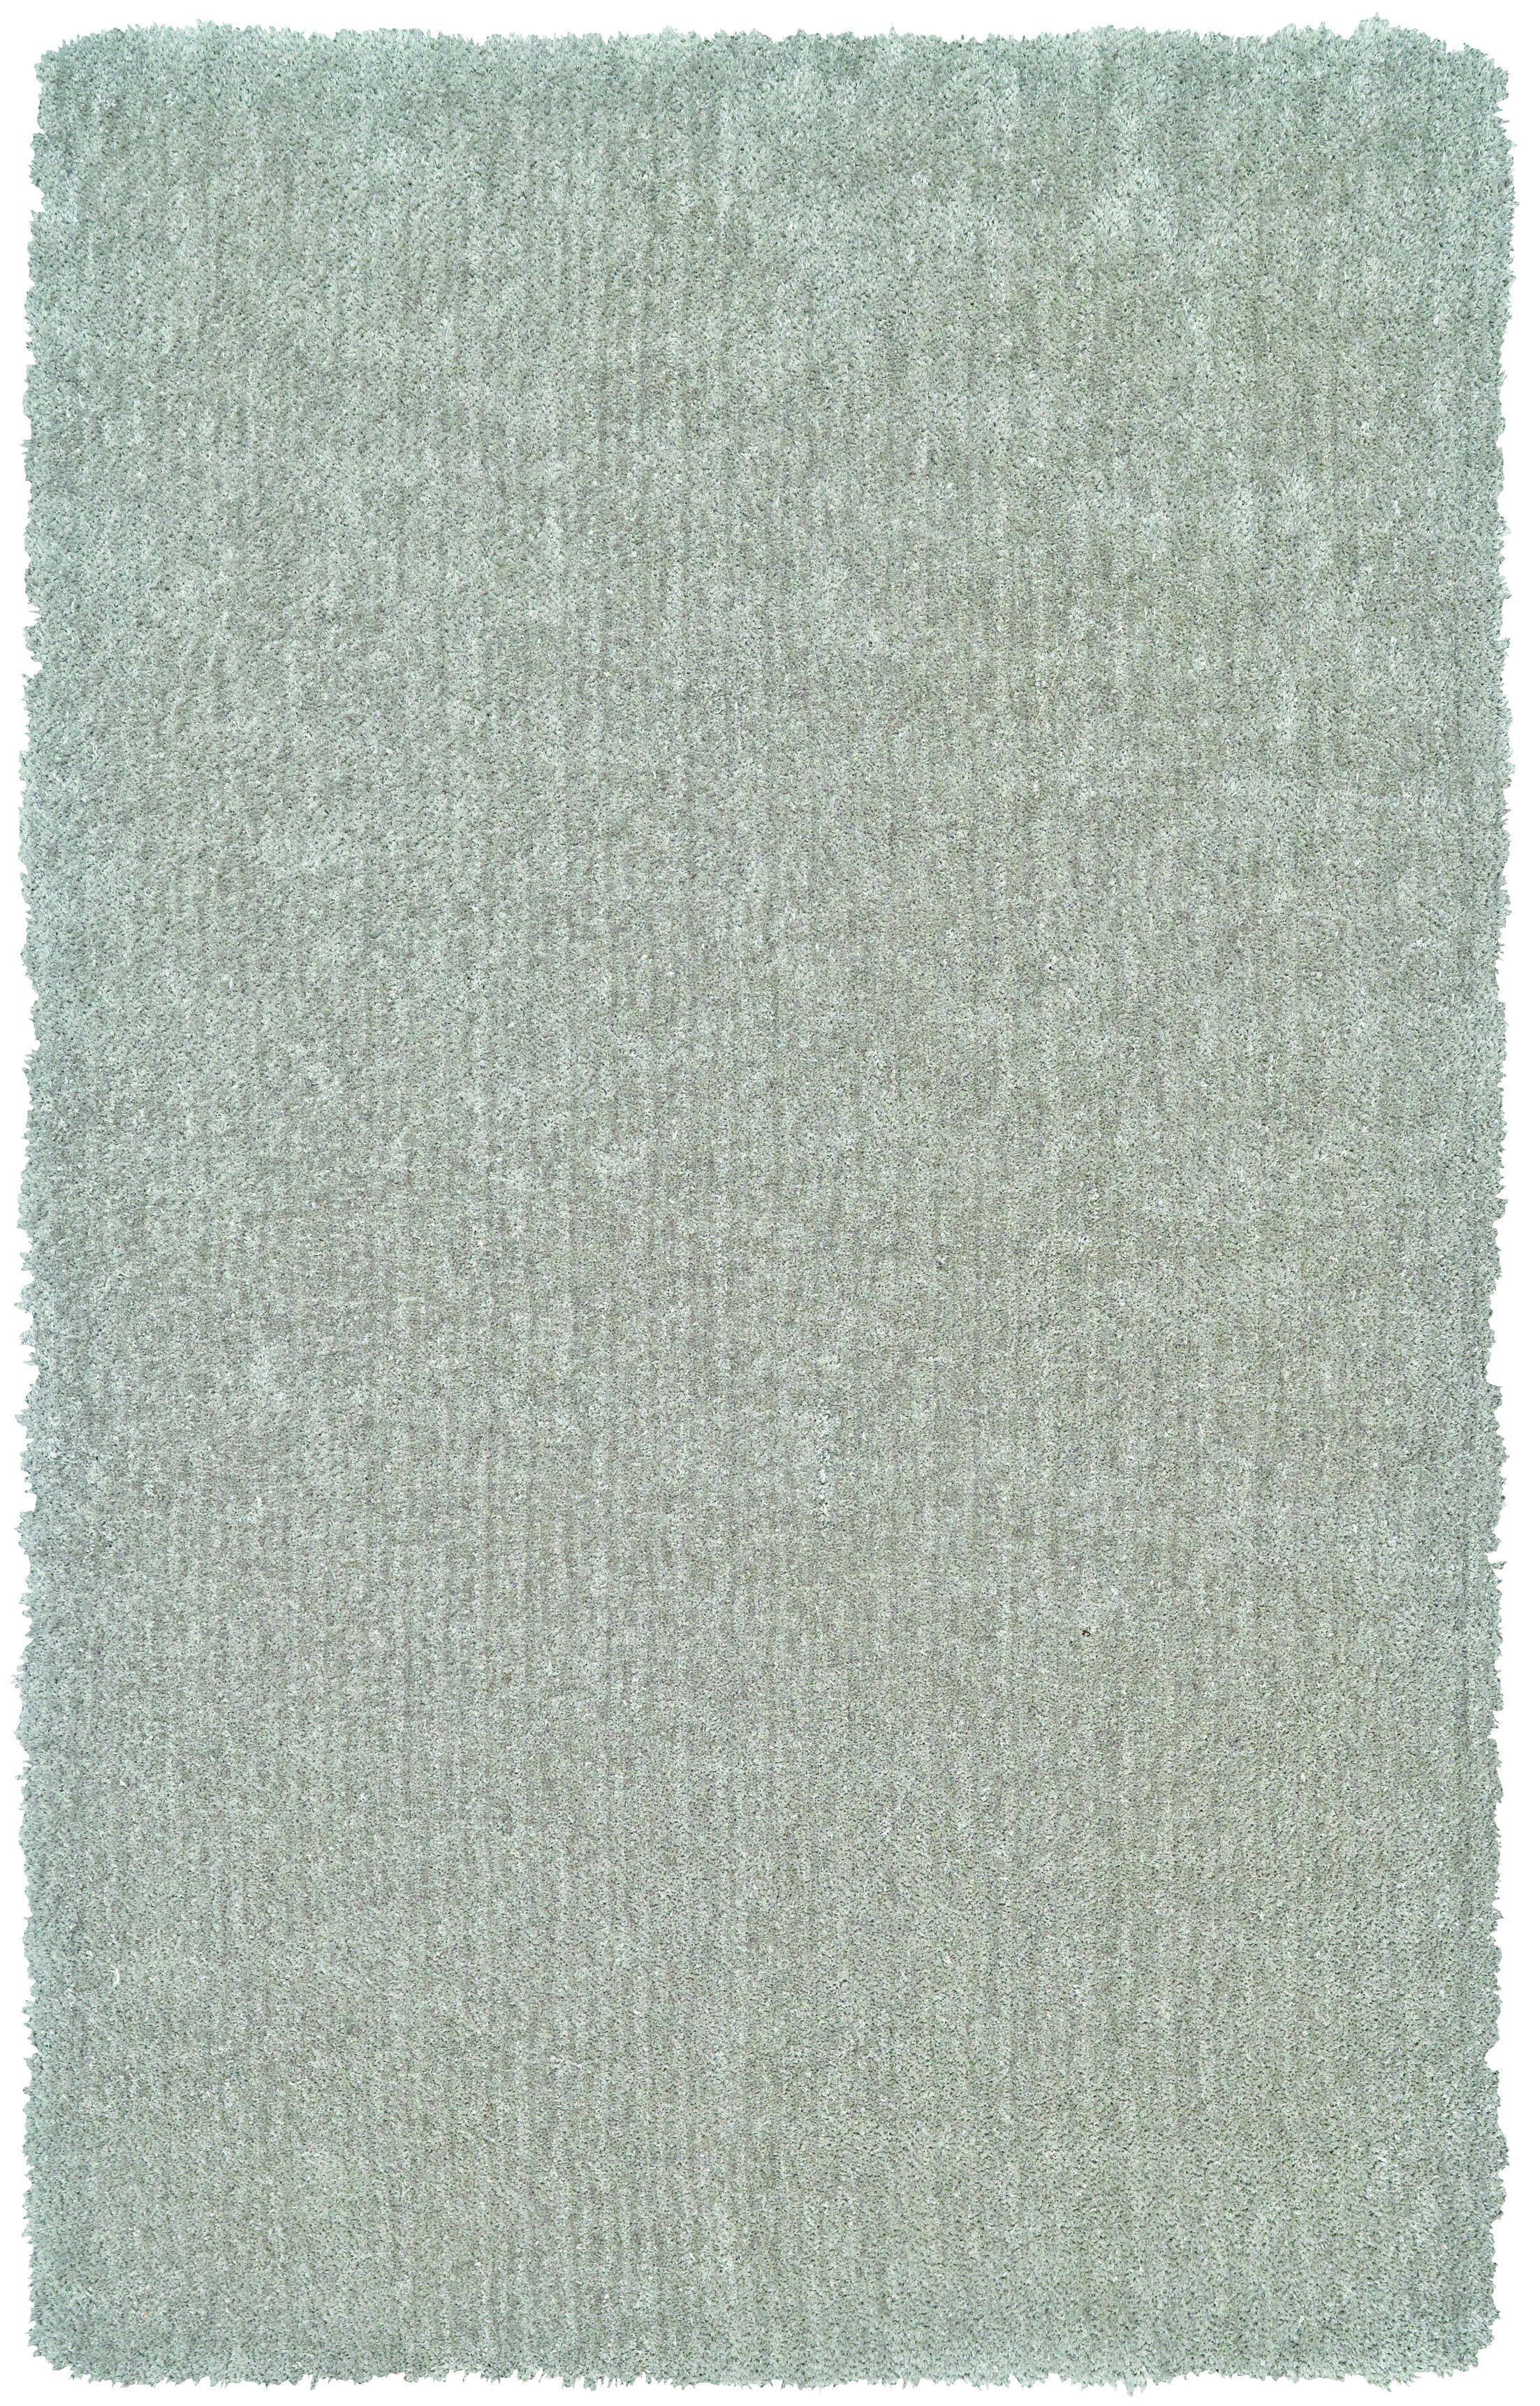 Carter Silver Area Rug Rug Size: Rectangle 8' x 11'